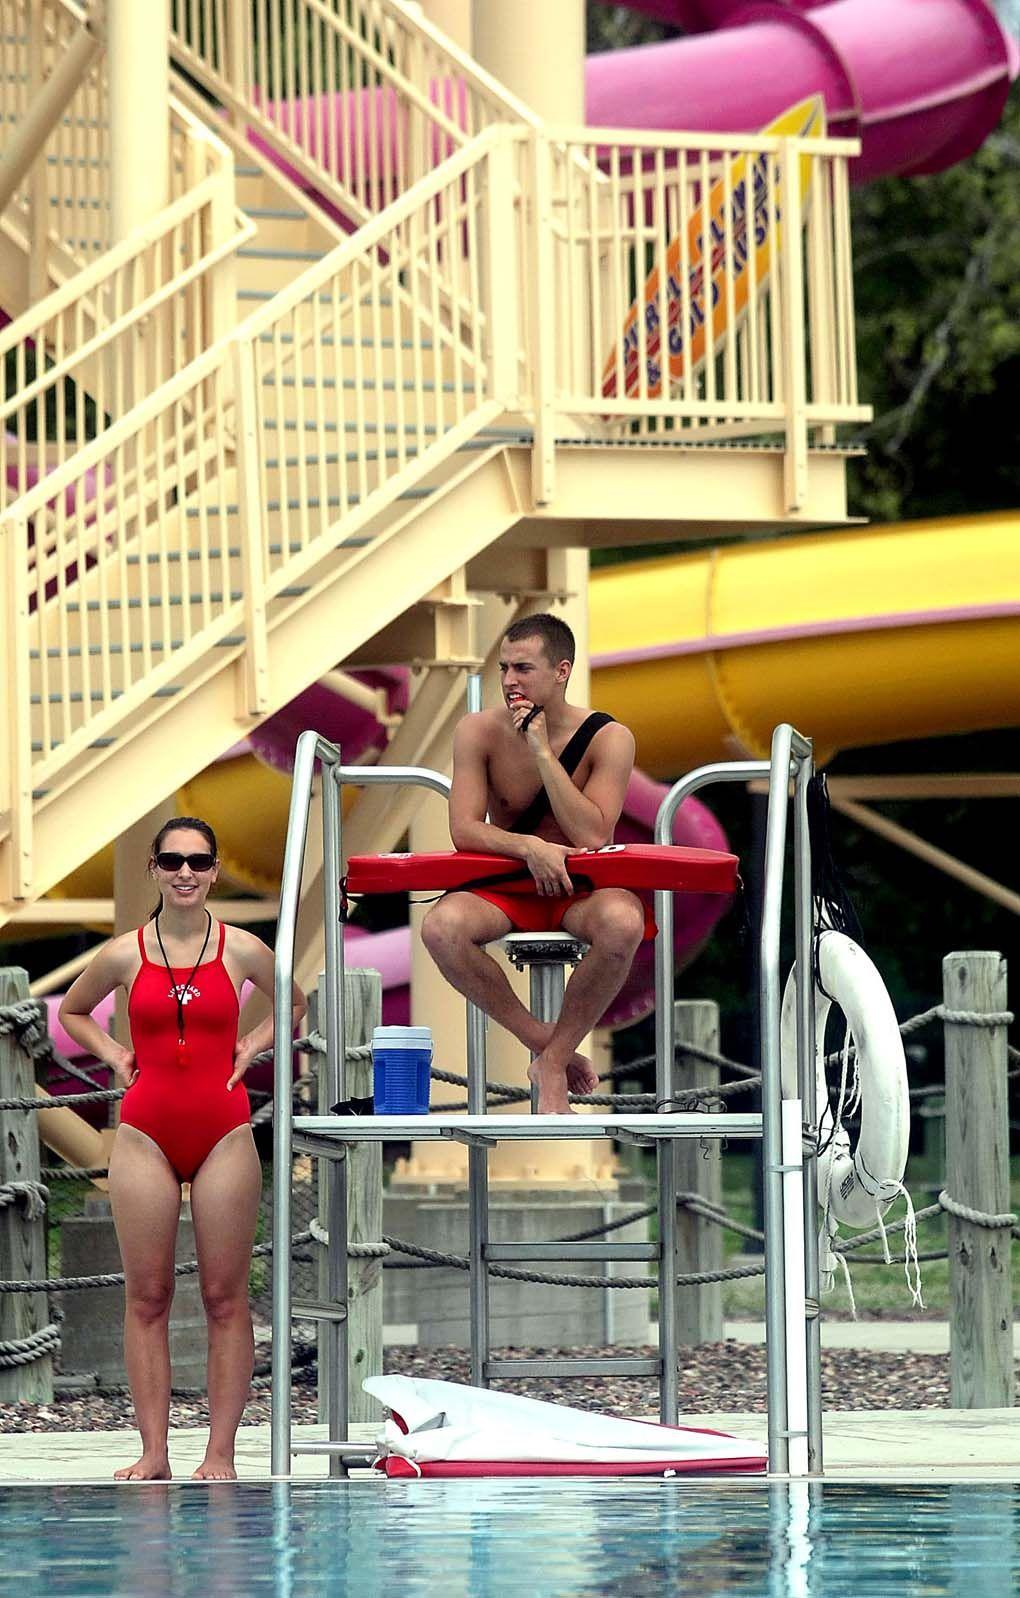 summer jobs hard to local news com summer work pool